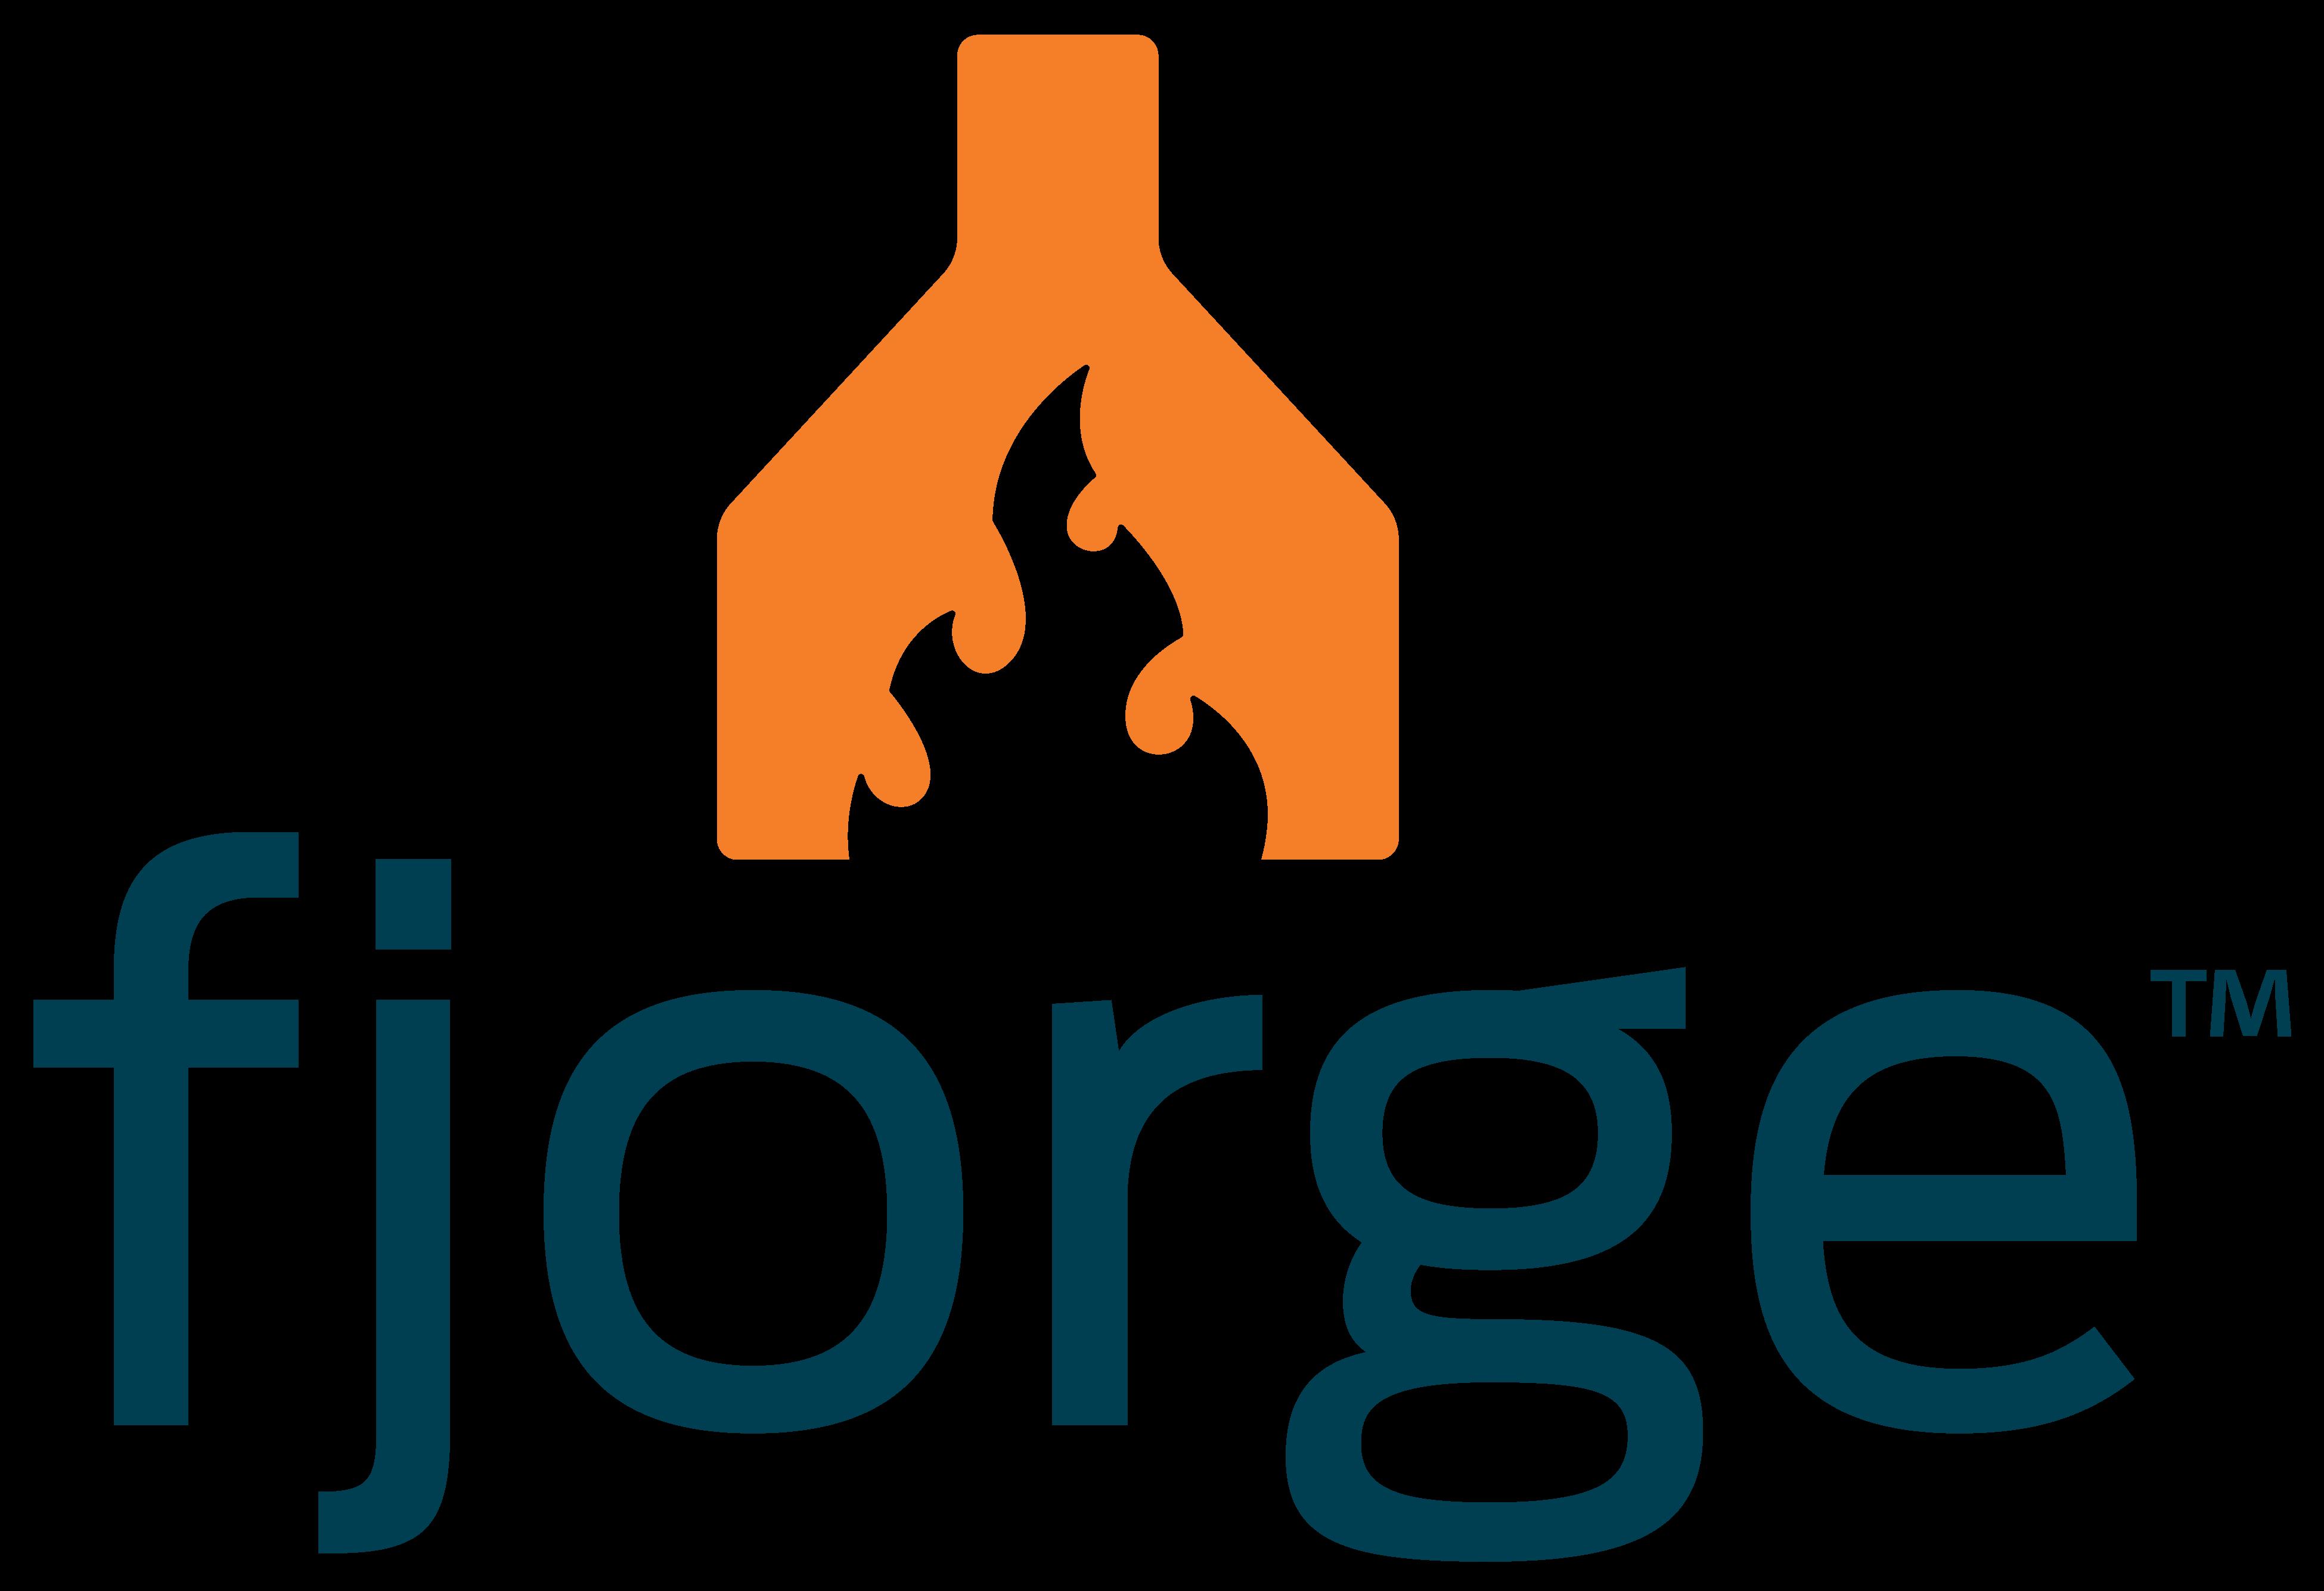 fjorge partner logo